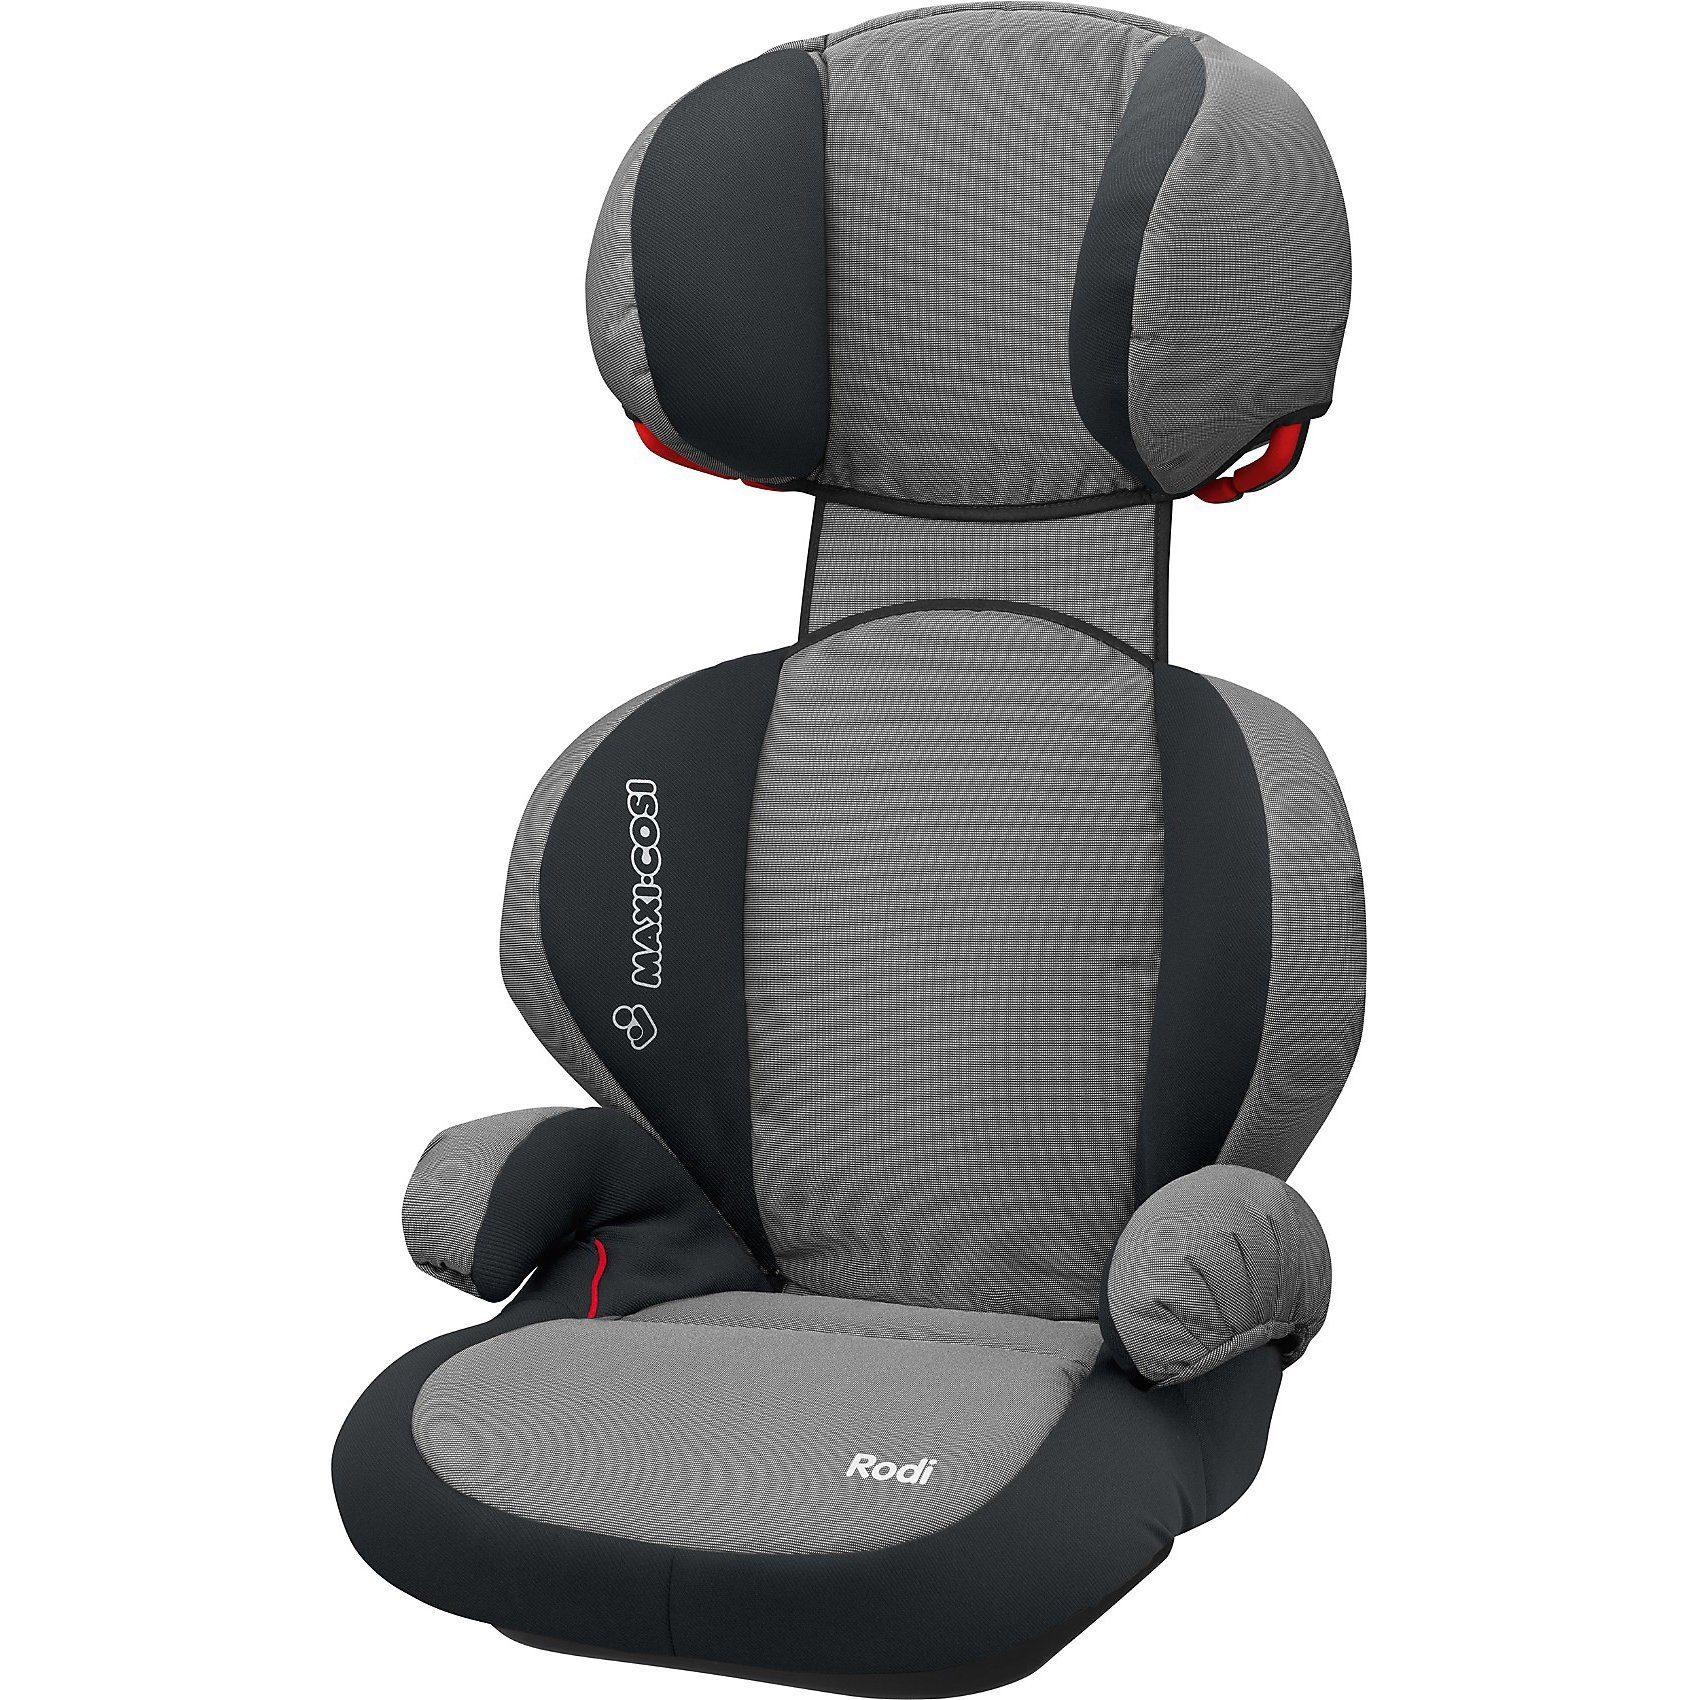 Maxi-Cosi Auto-Kindersitz Rodi SPS, Björn, 2016